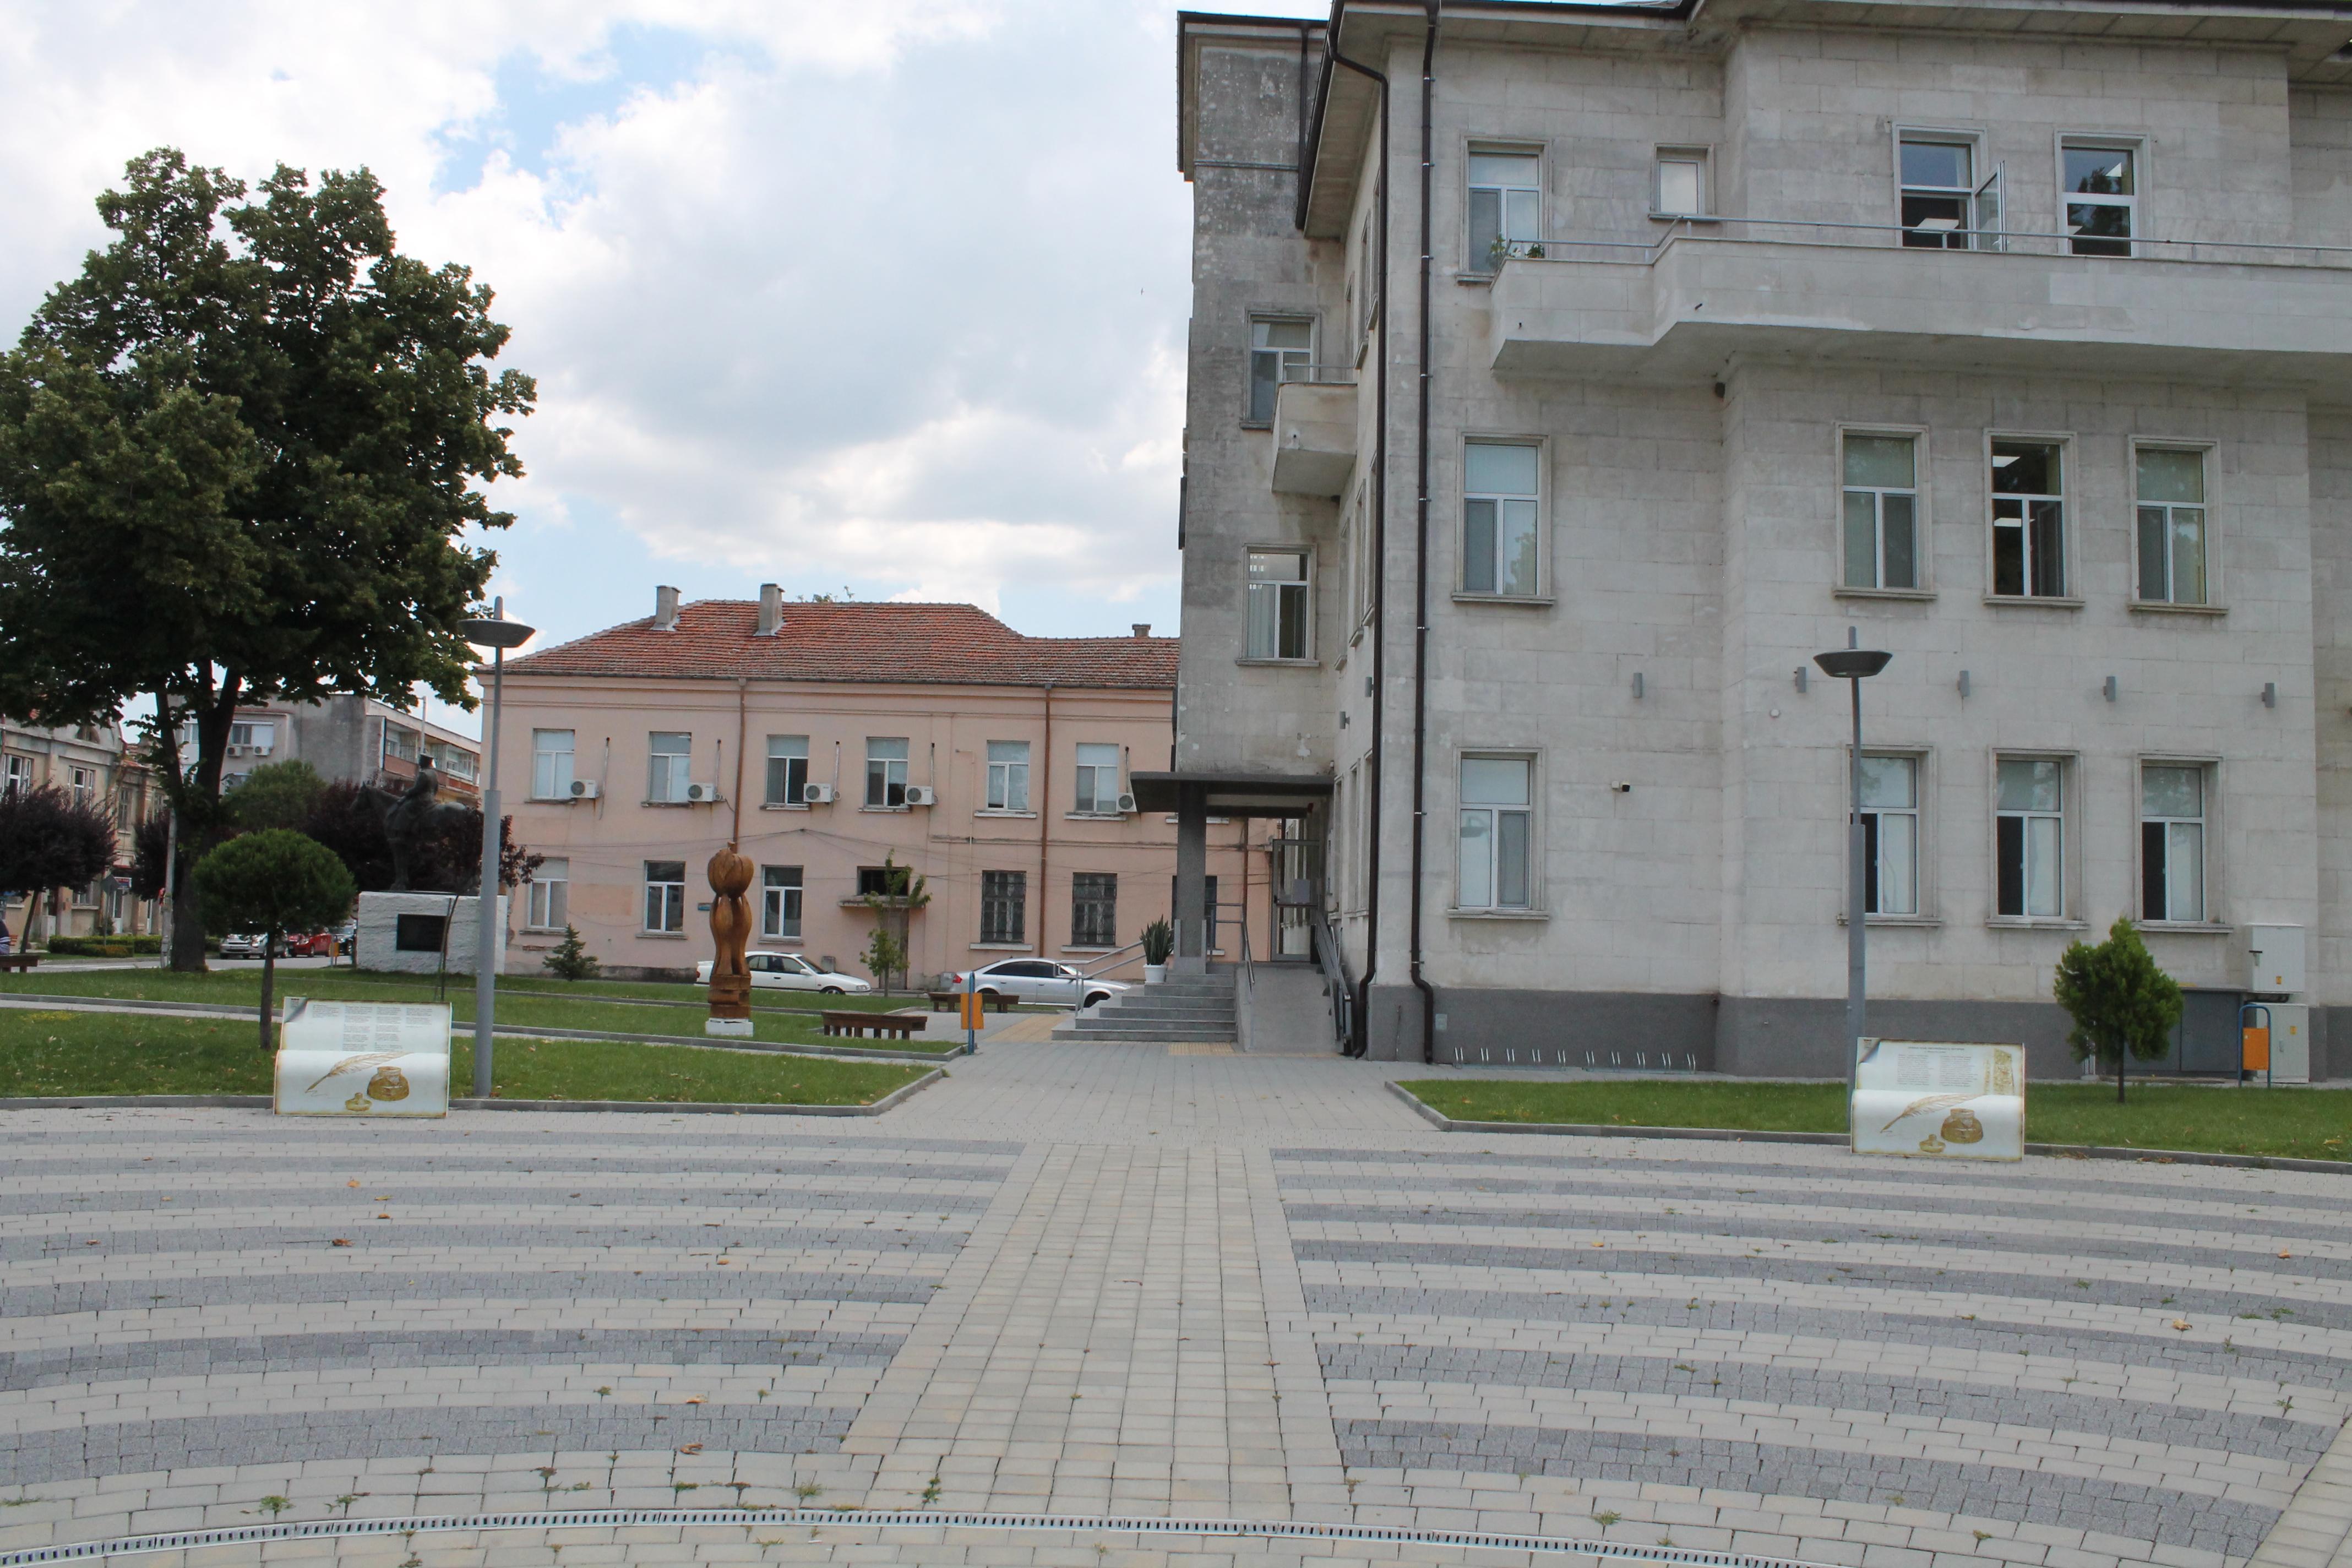 Пейки-книги поставиха пред библиотеката в Свиленград